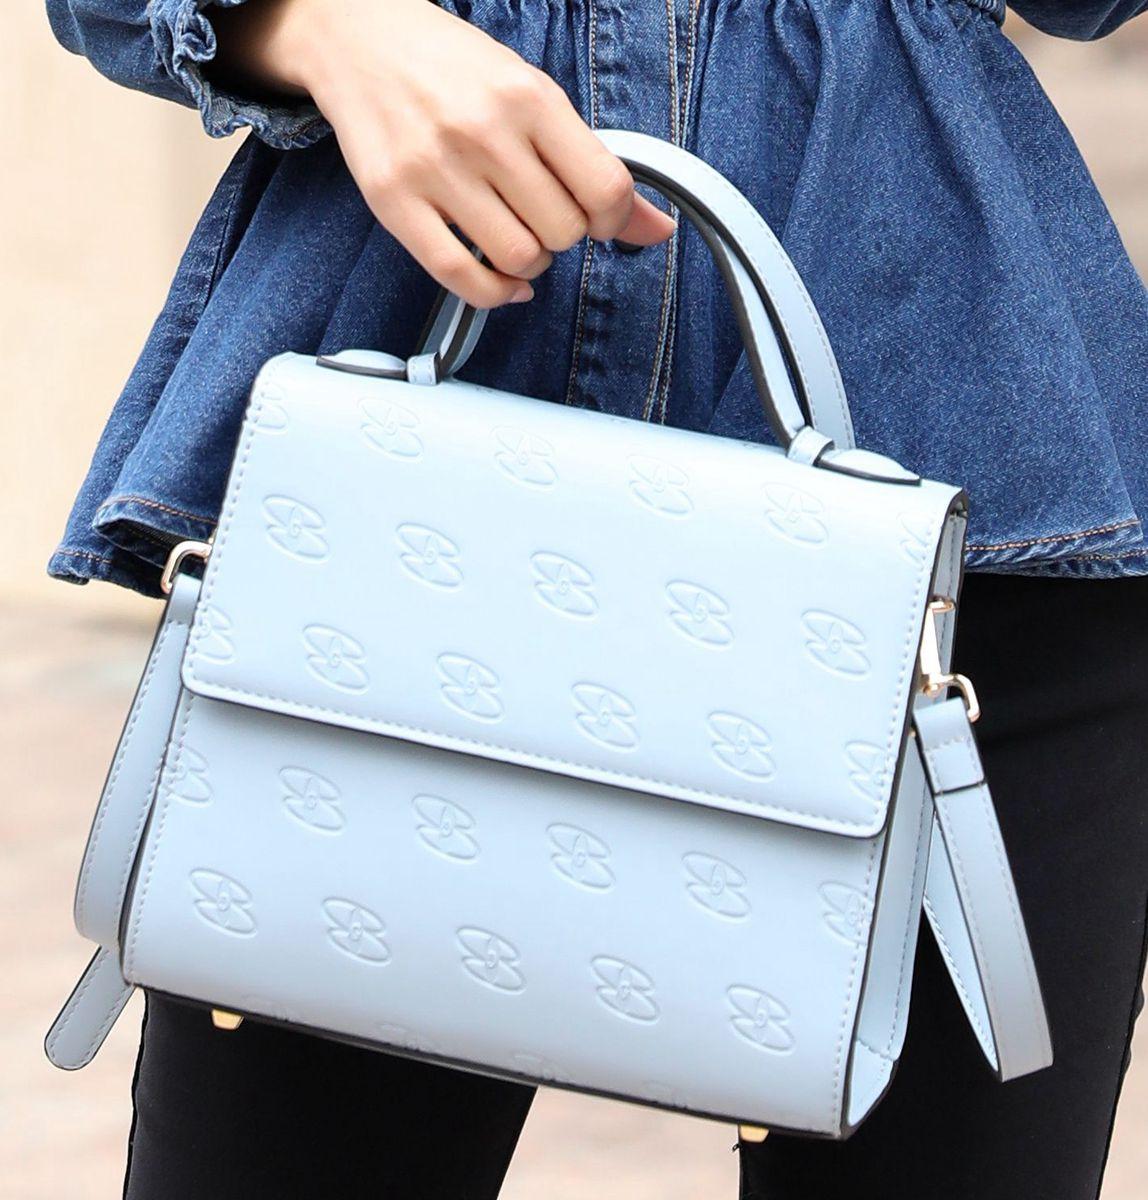 2020 new ecofriendly PU leather custom handbag shoulder bags womens bags